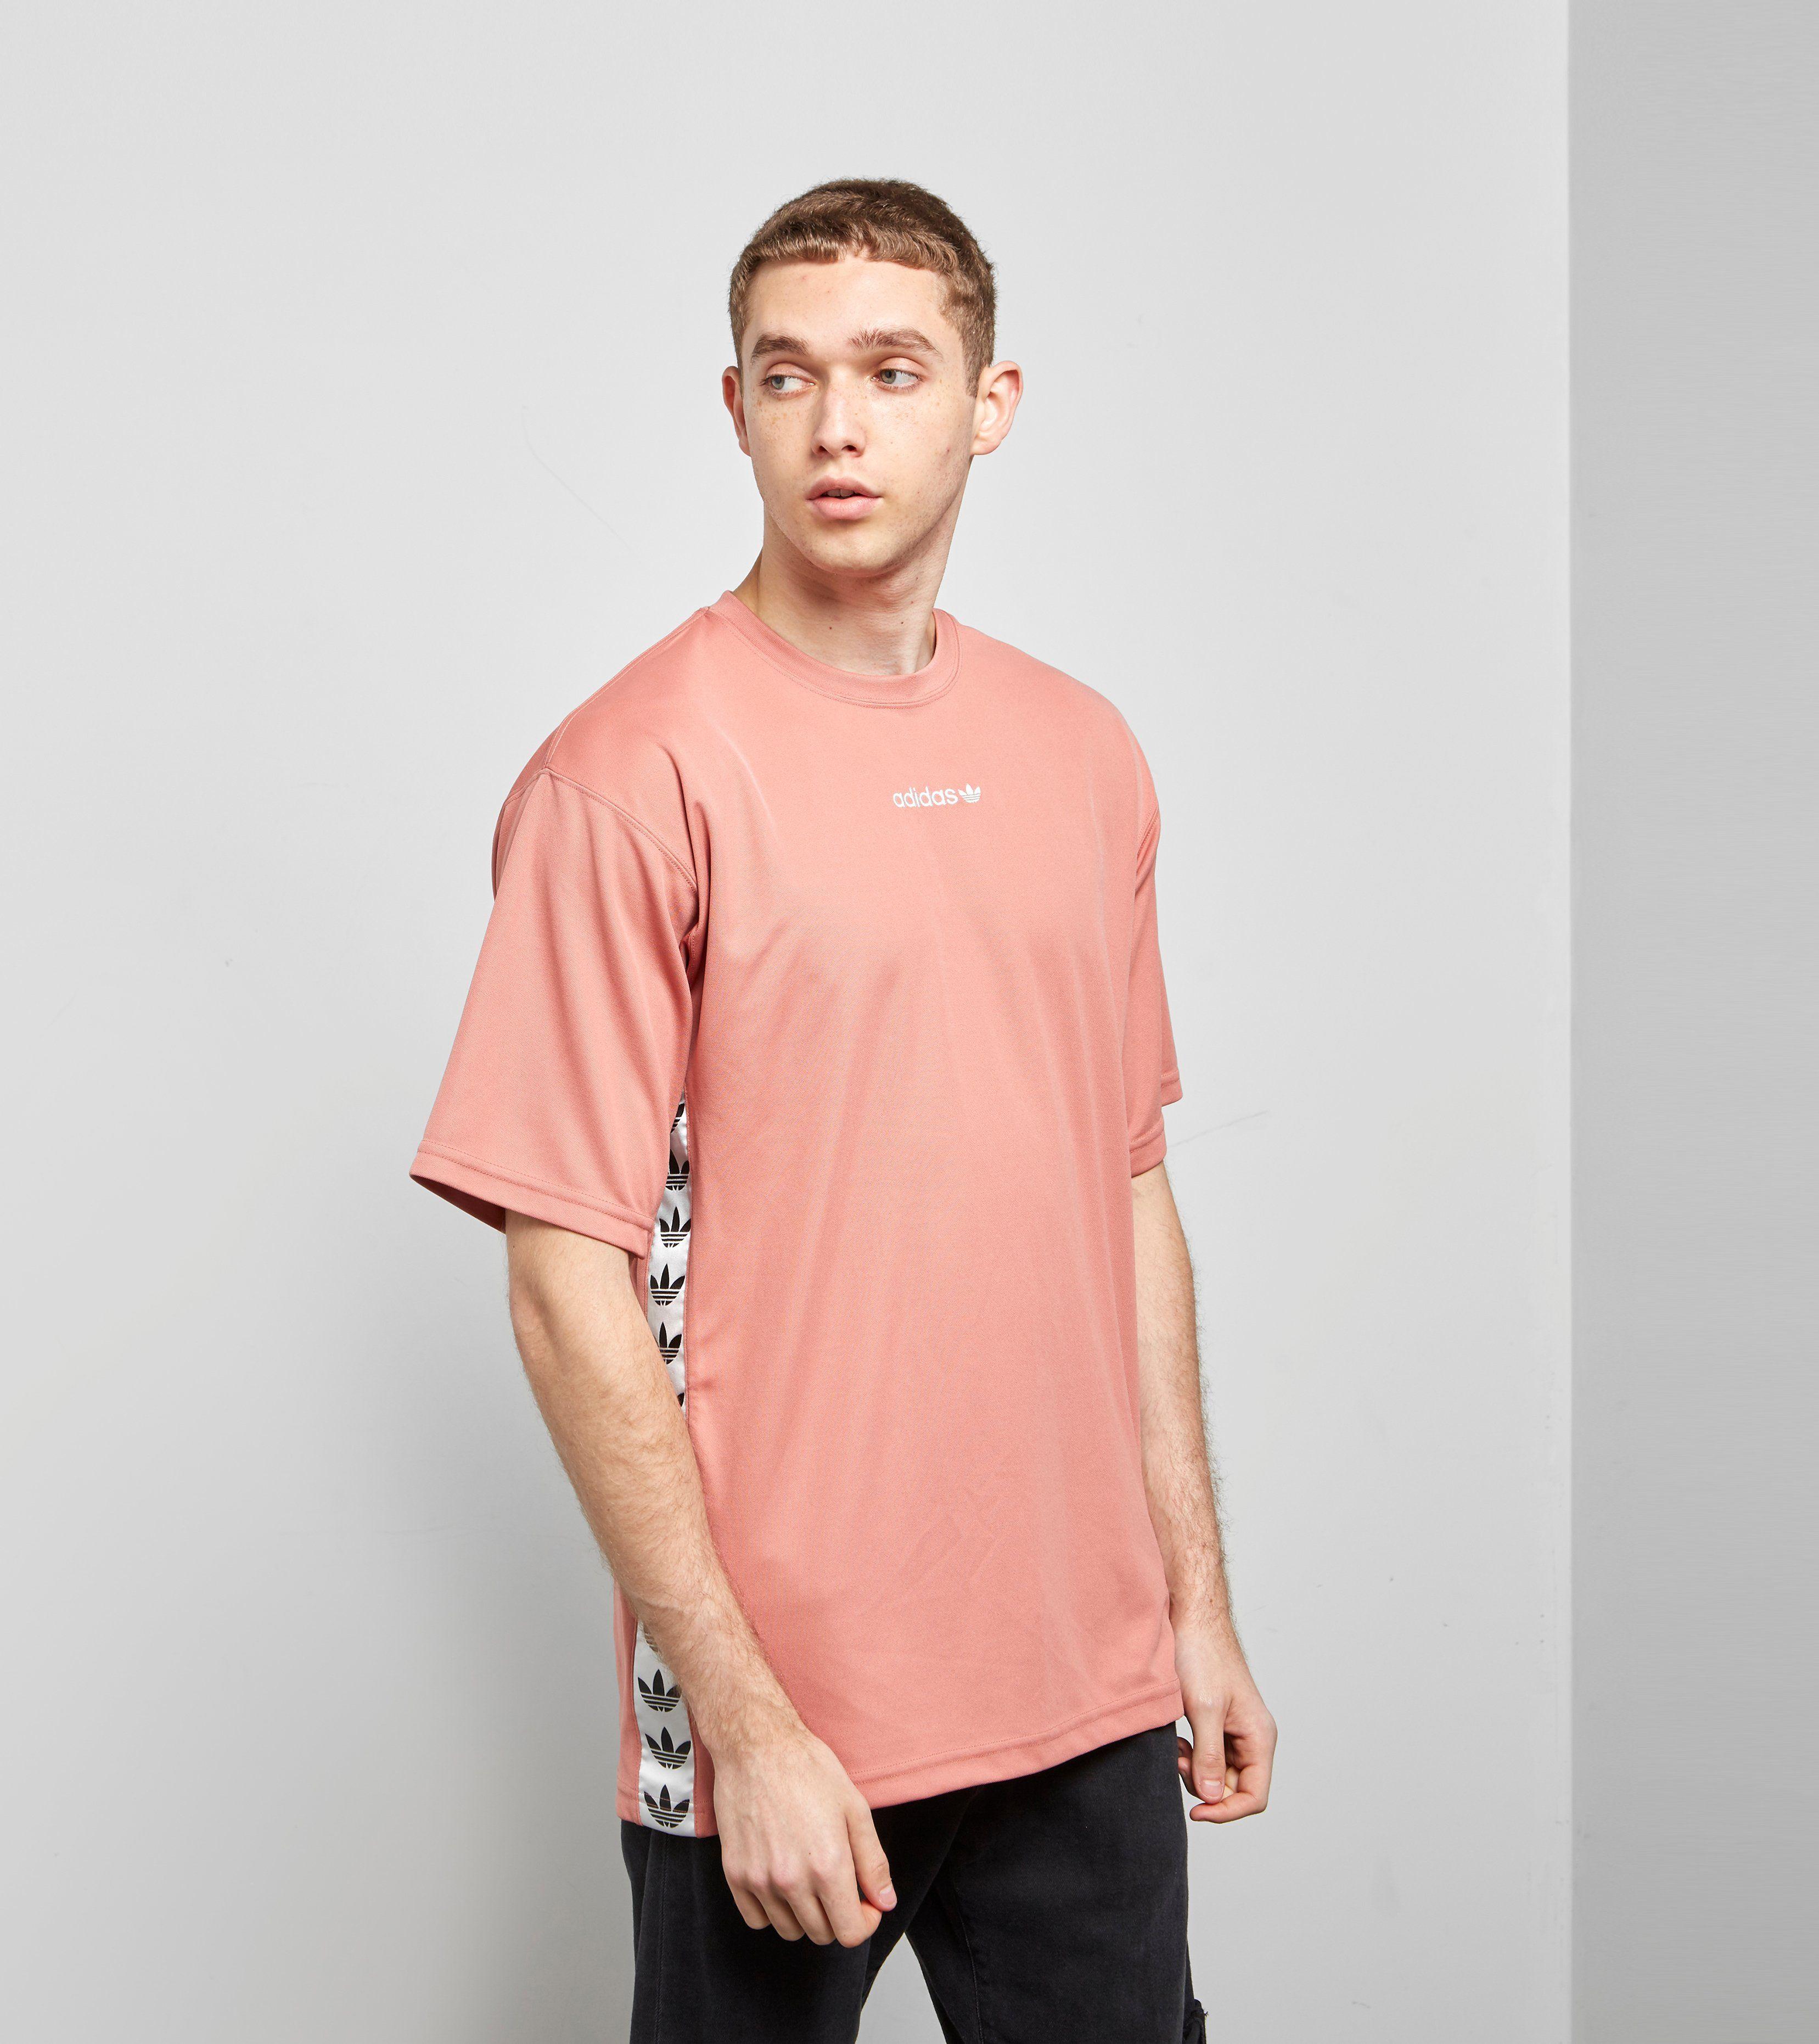 adidas Originals Tape T-Shirt - size? Exclusive